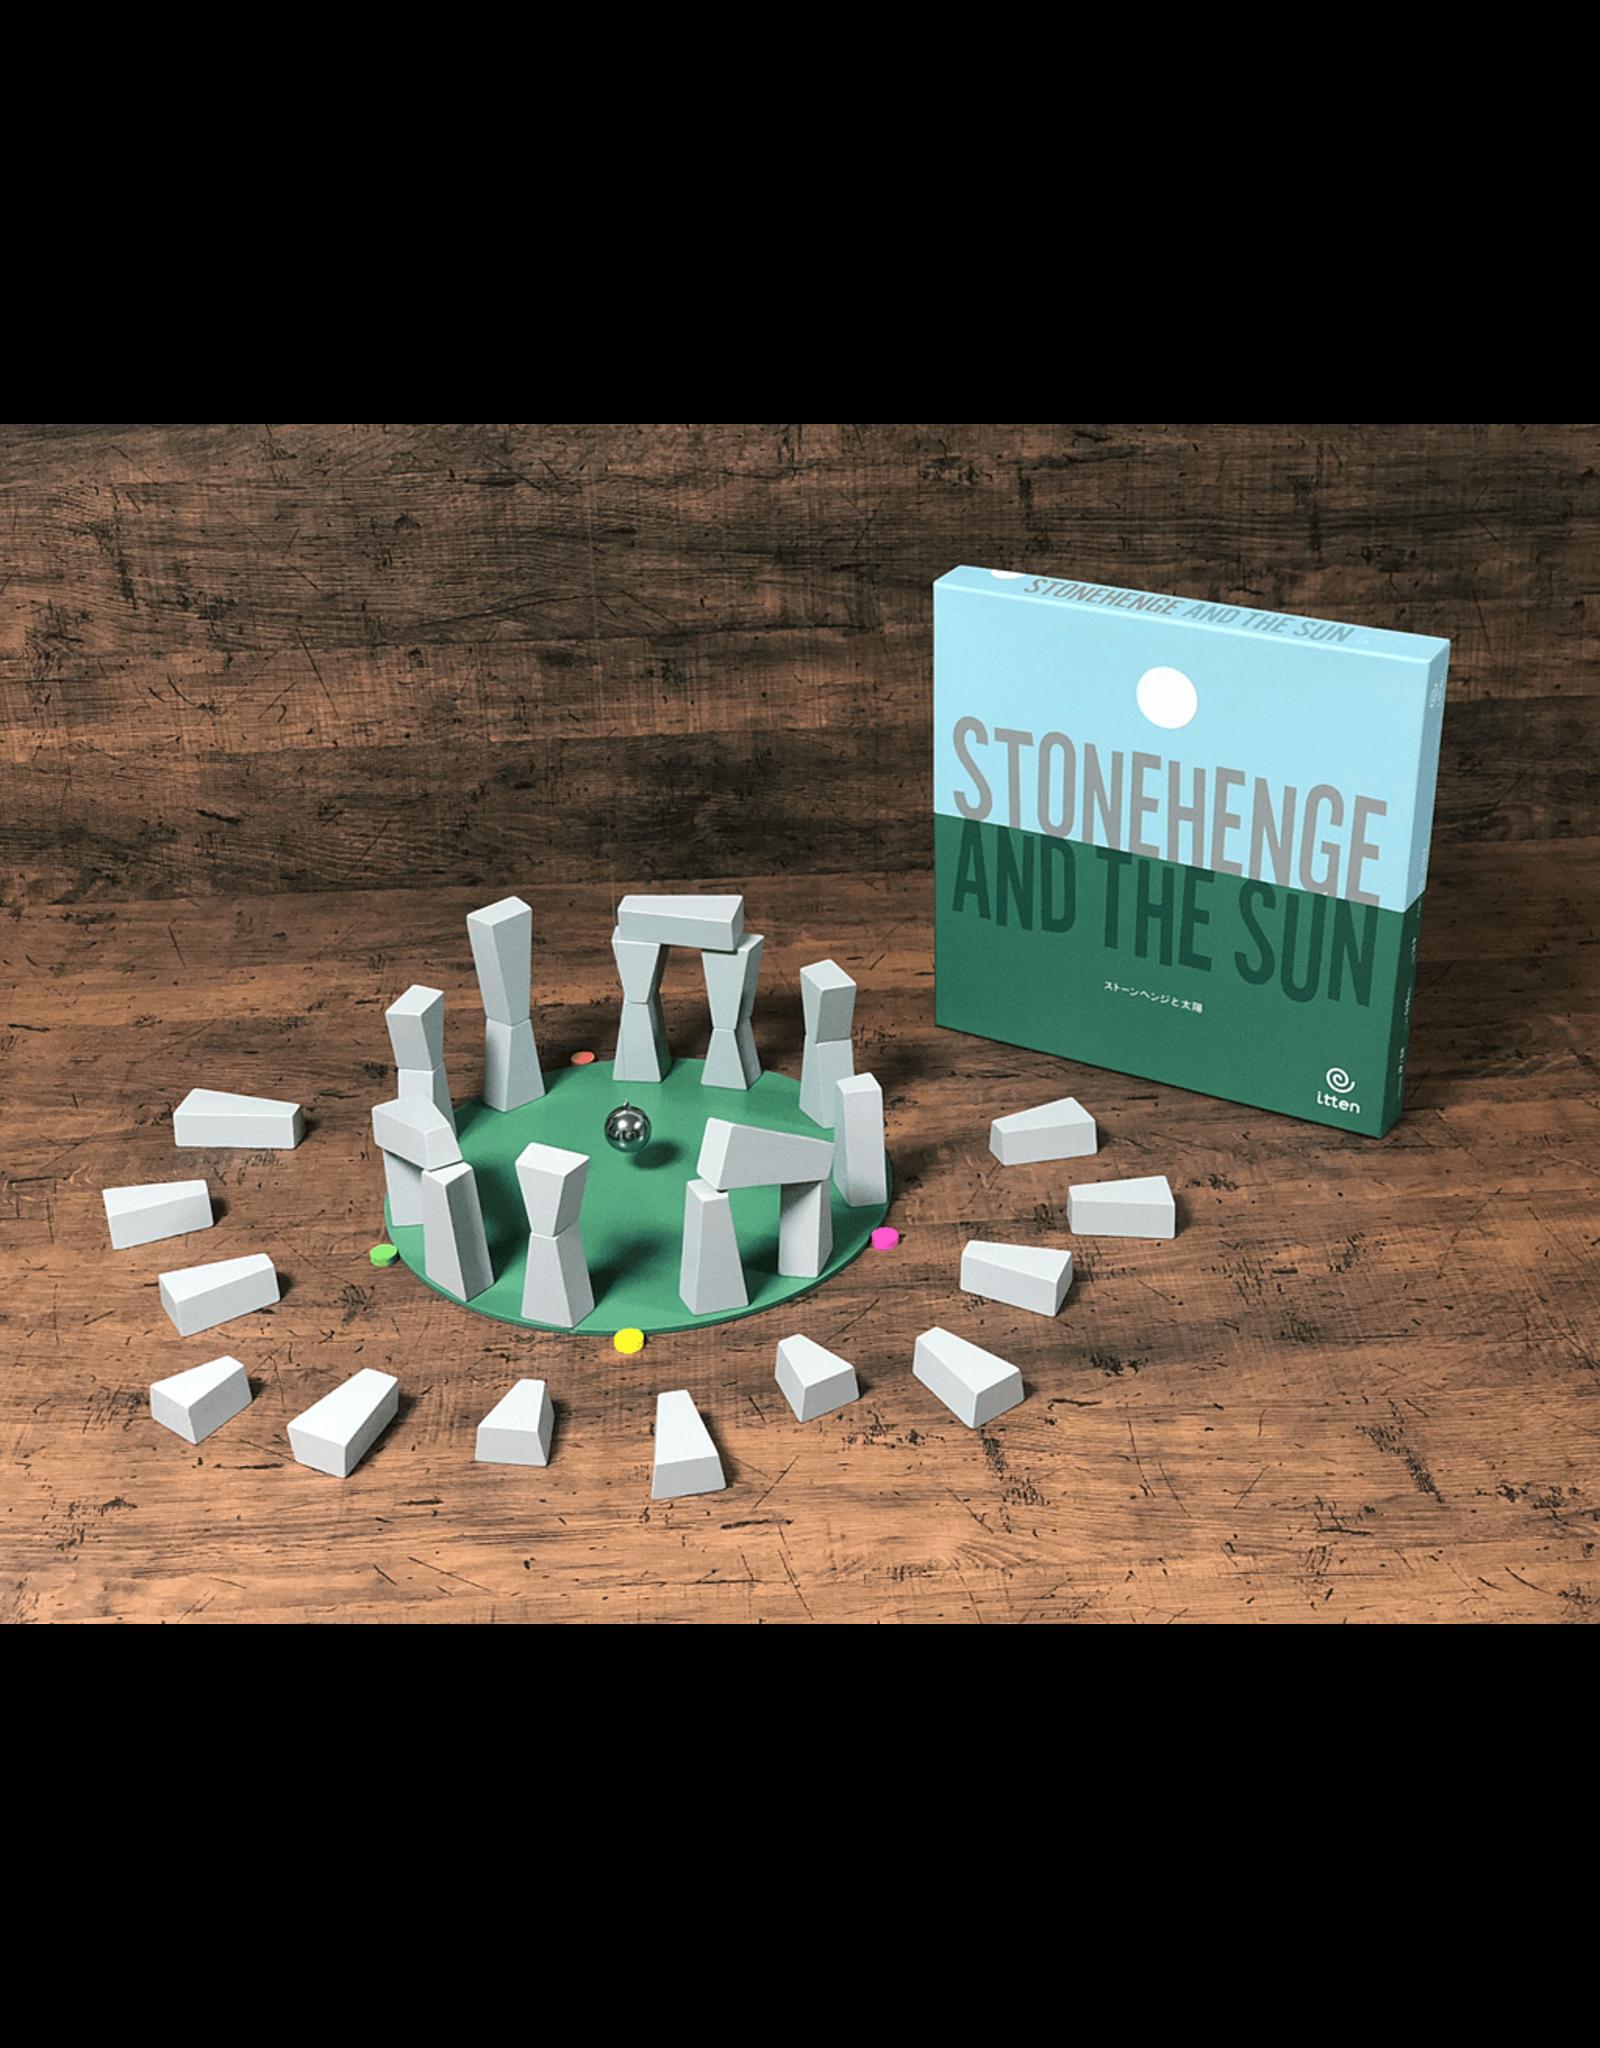 Stonehenge and the Sun